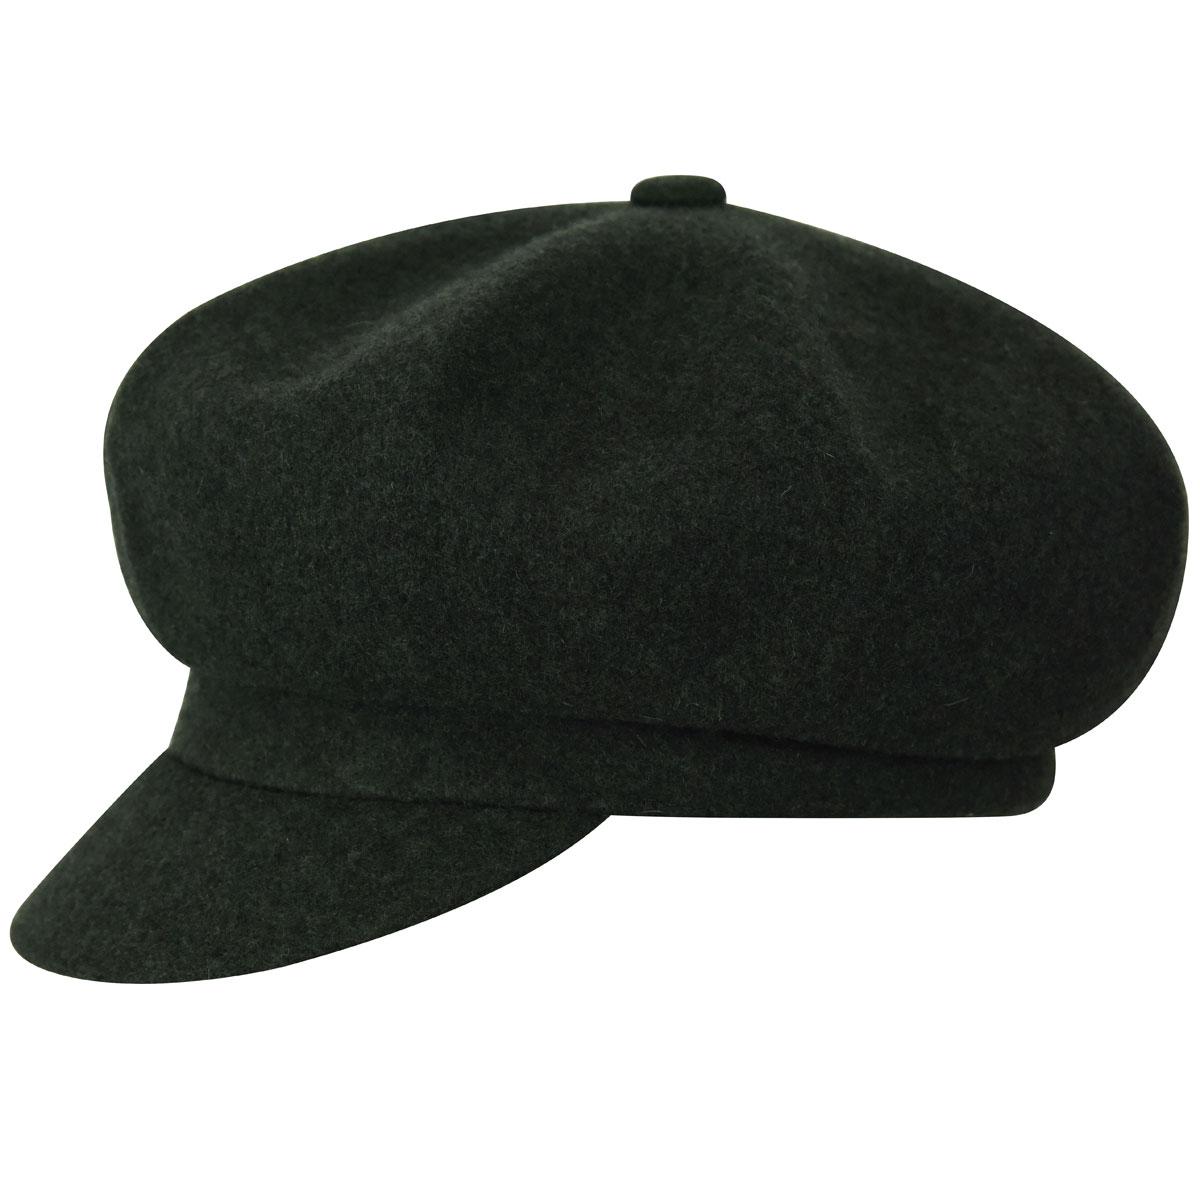 New Edwardian Style Men's Hats 1900-1920 Wool Hawker $60.00 AT vintagedancer.com